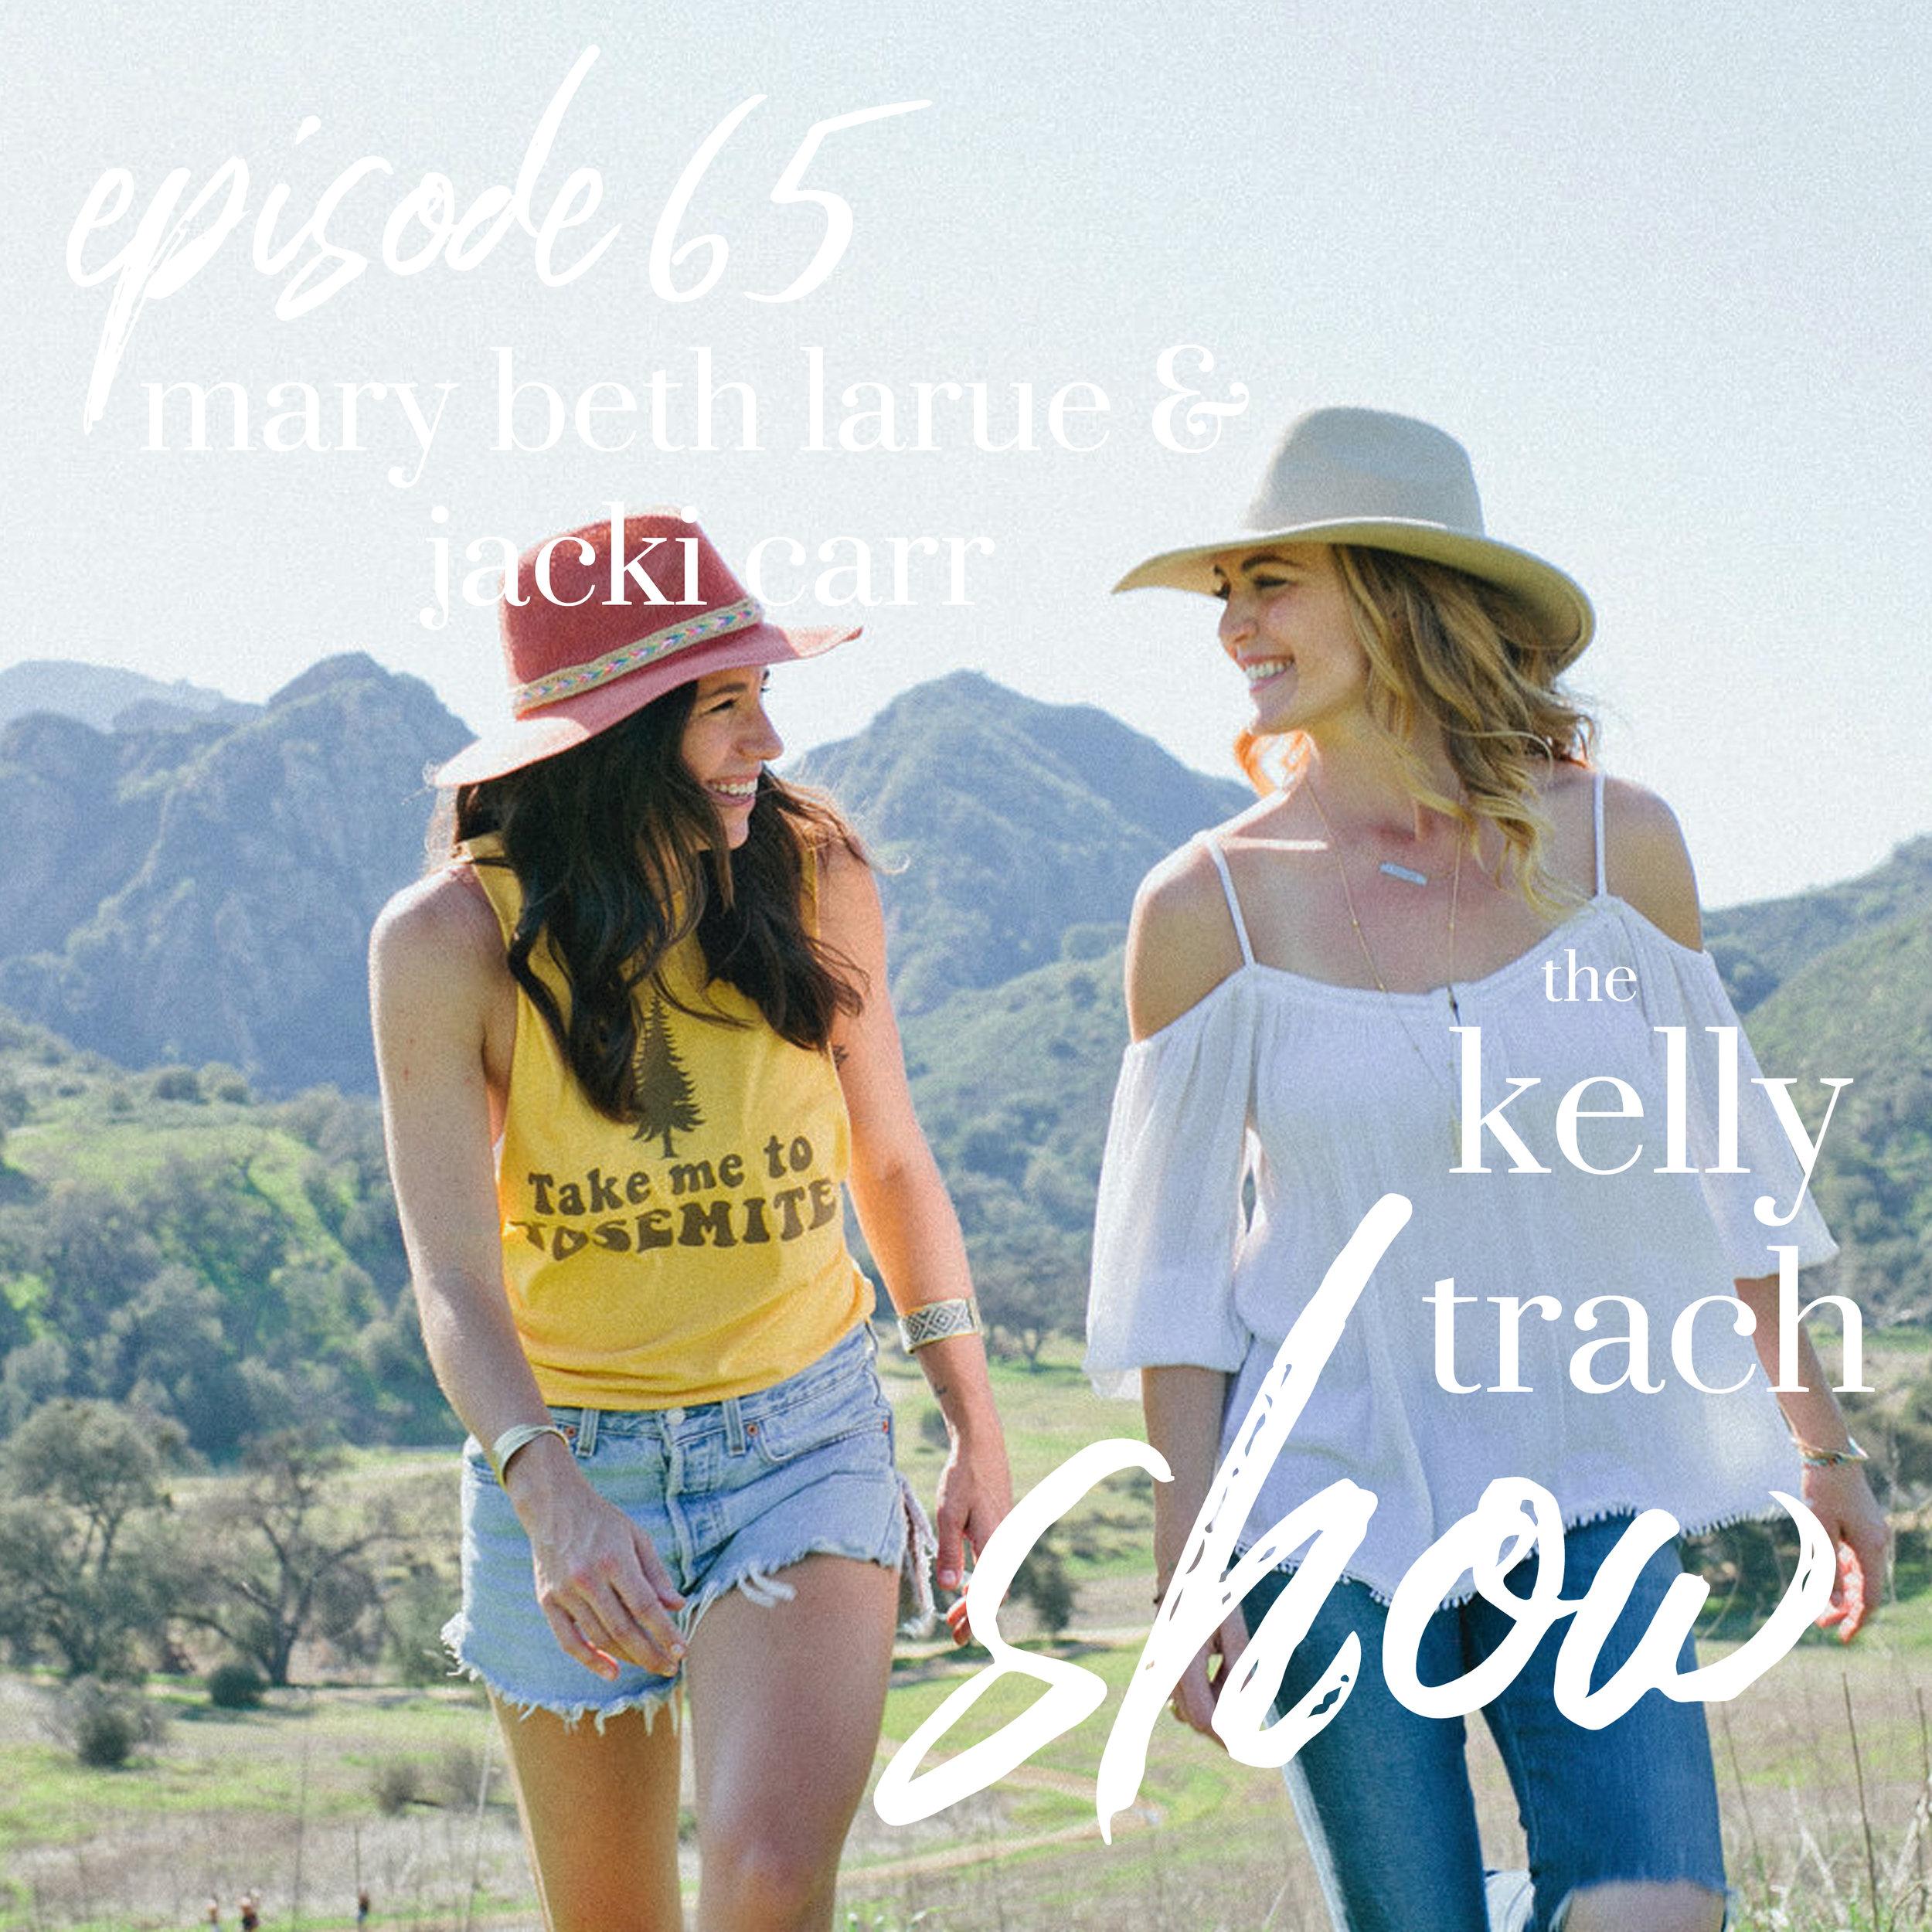 65 - Mary Beth LaRue & Jacki Carr - The Kelly Trach Show.jpg